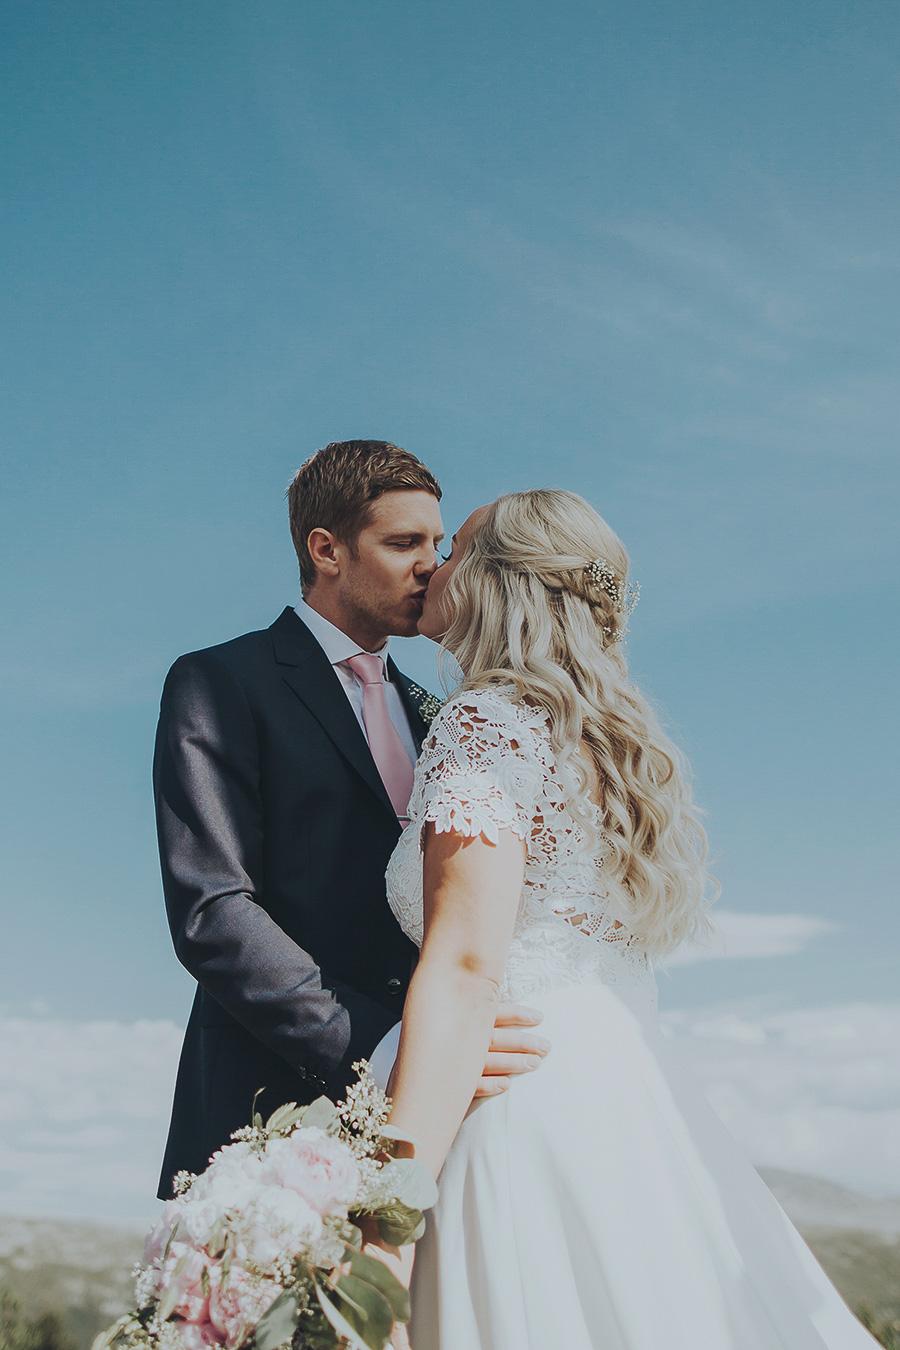 Bridal couple kissing at their wedding